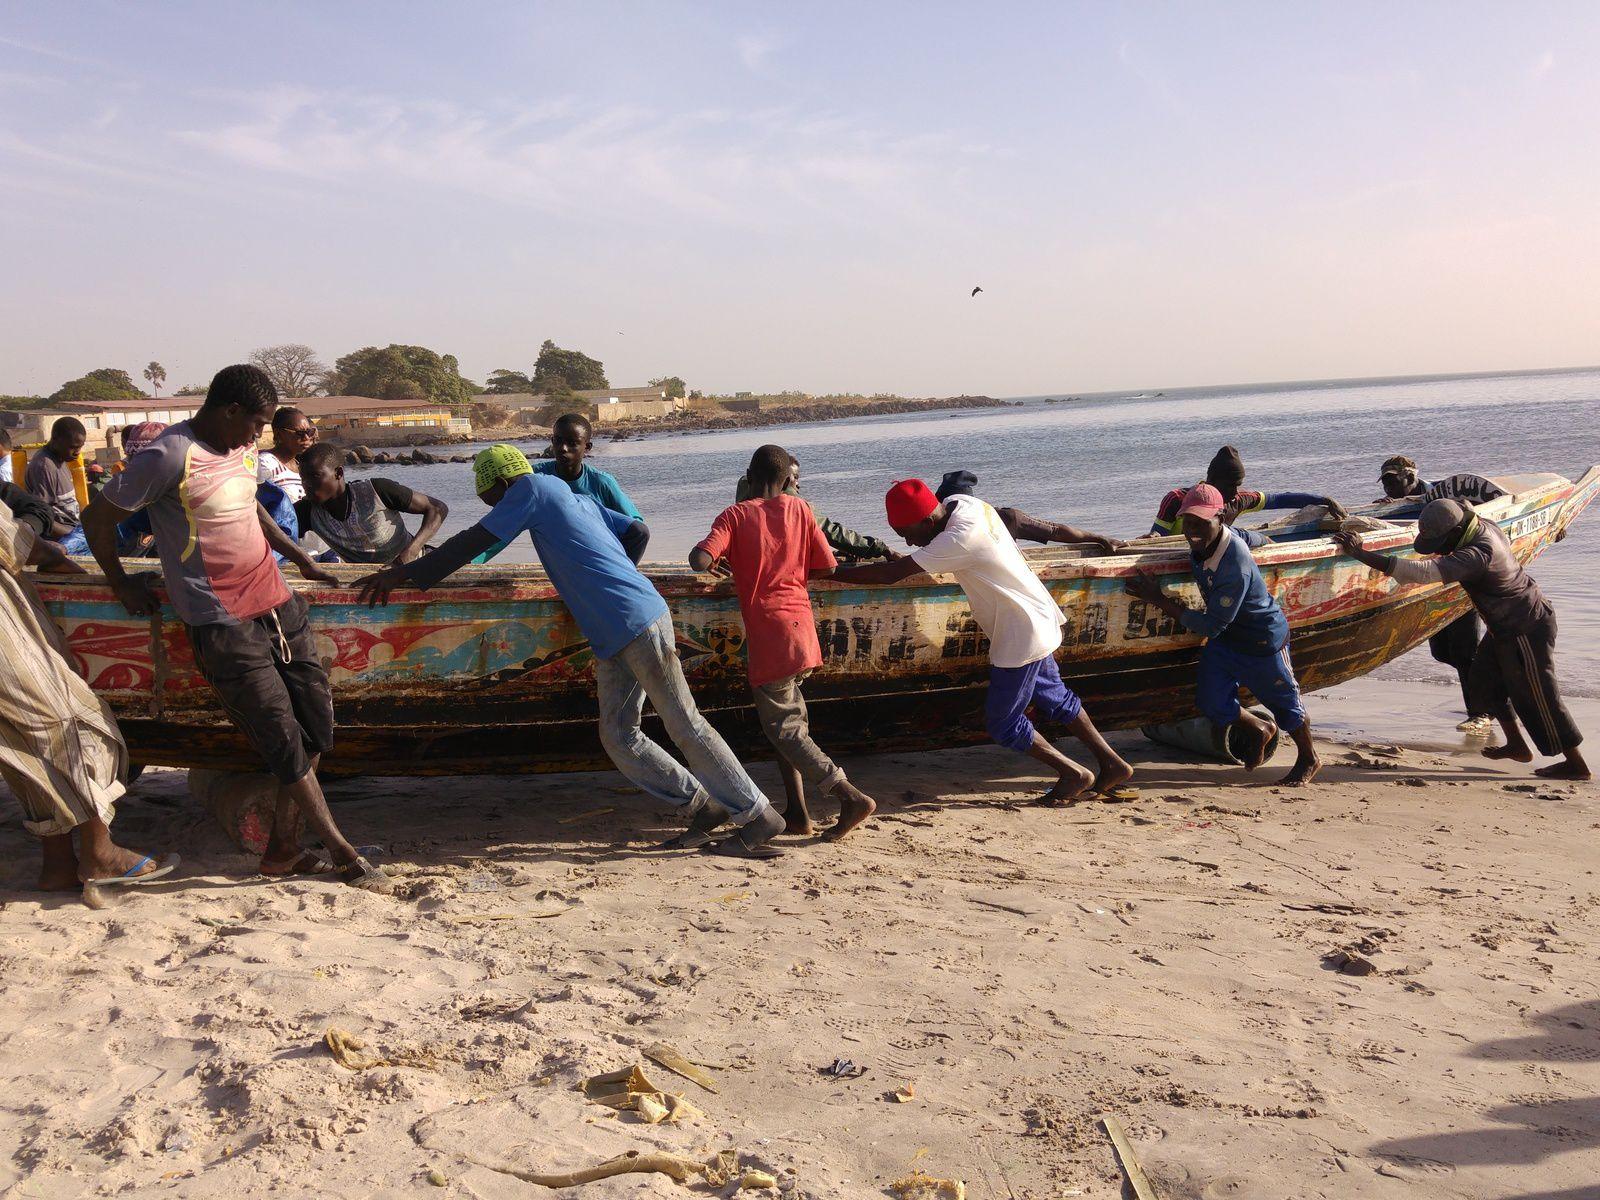 L'arrivée des pêcheurs de Soumbédioune, Dakar